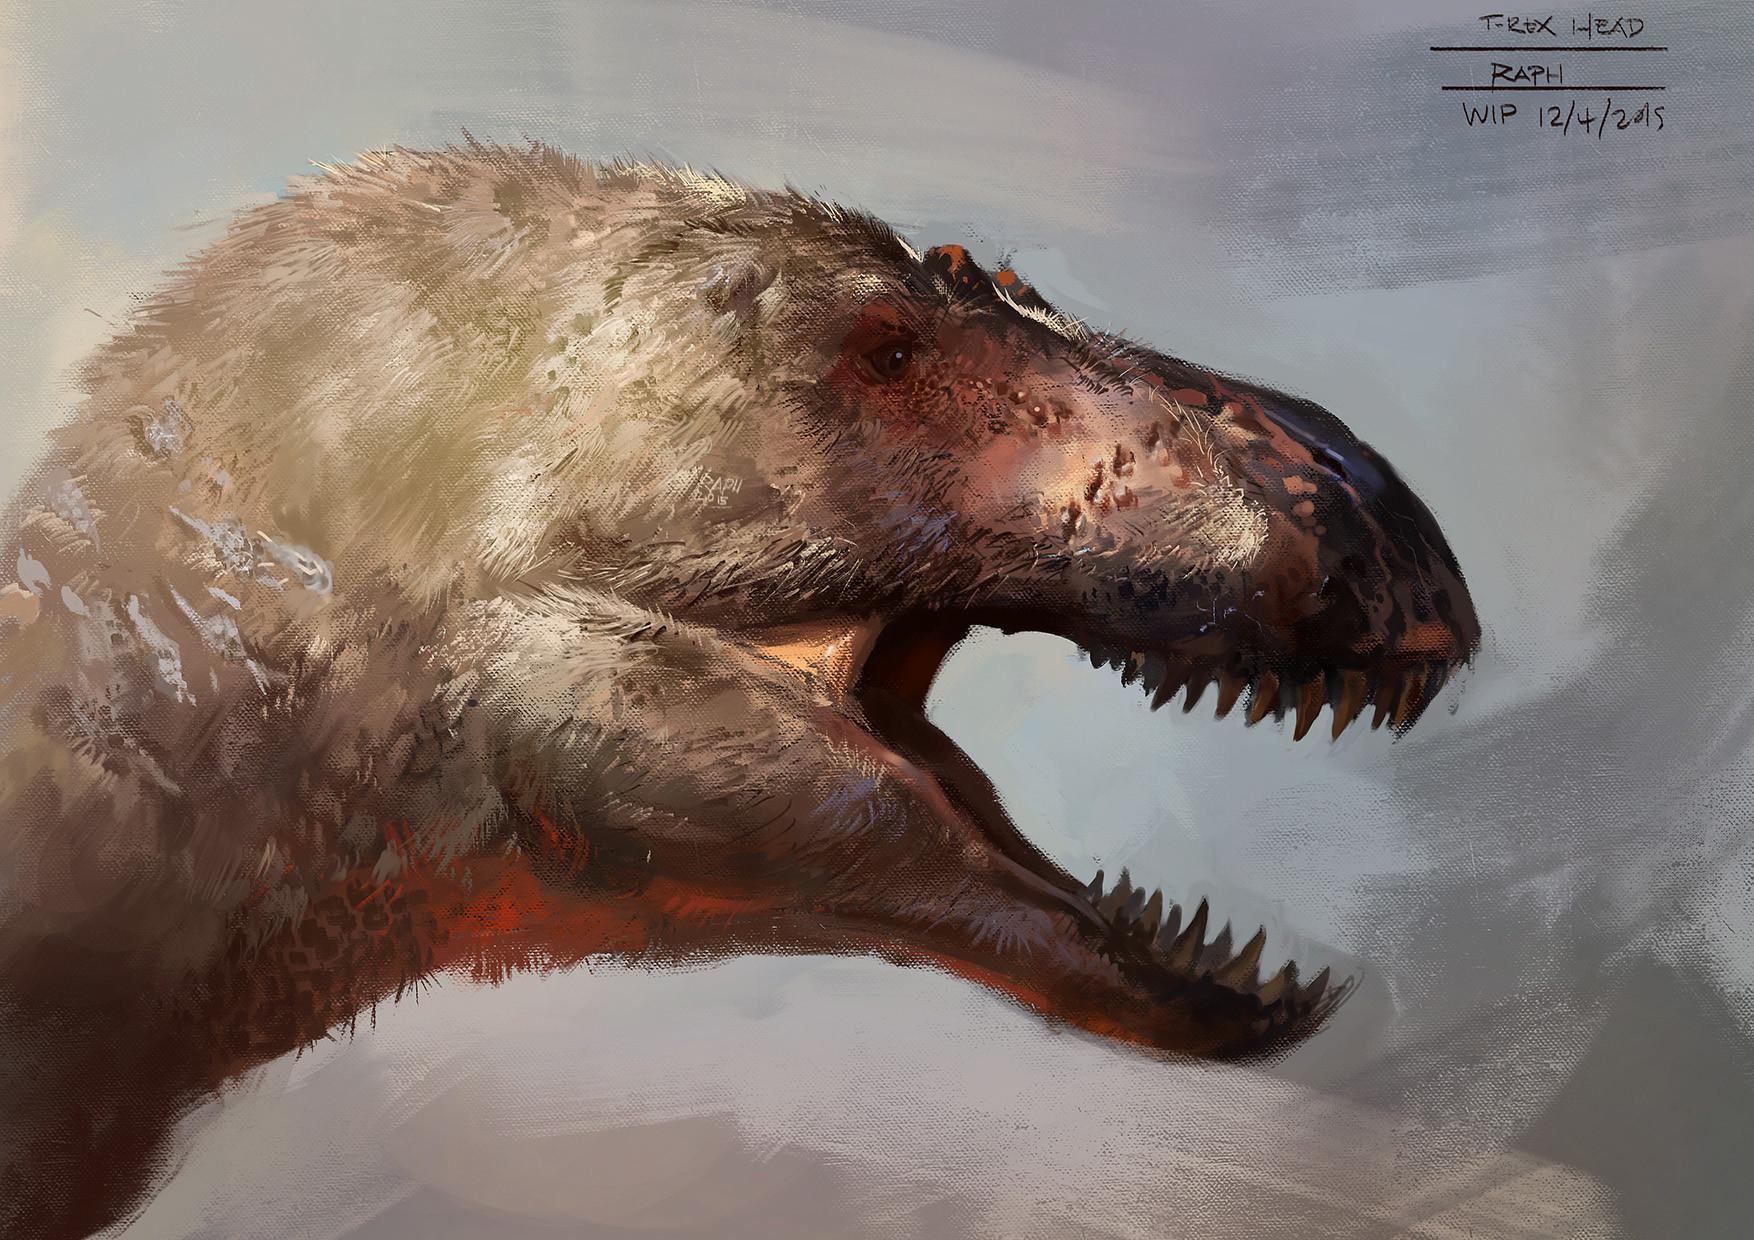 Raph lomotan t rex head